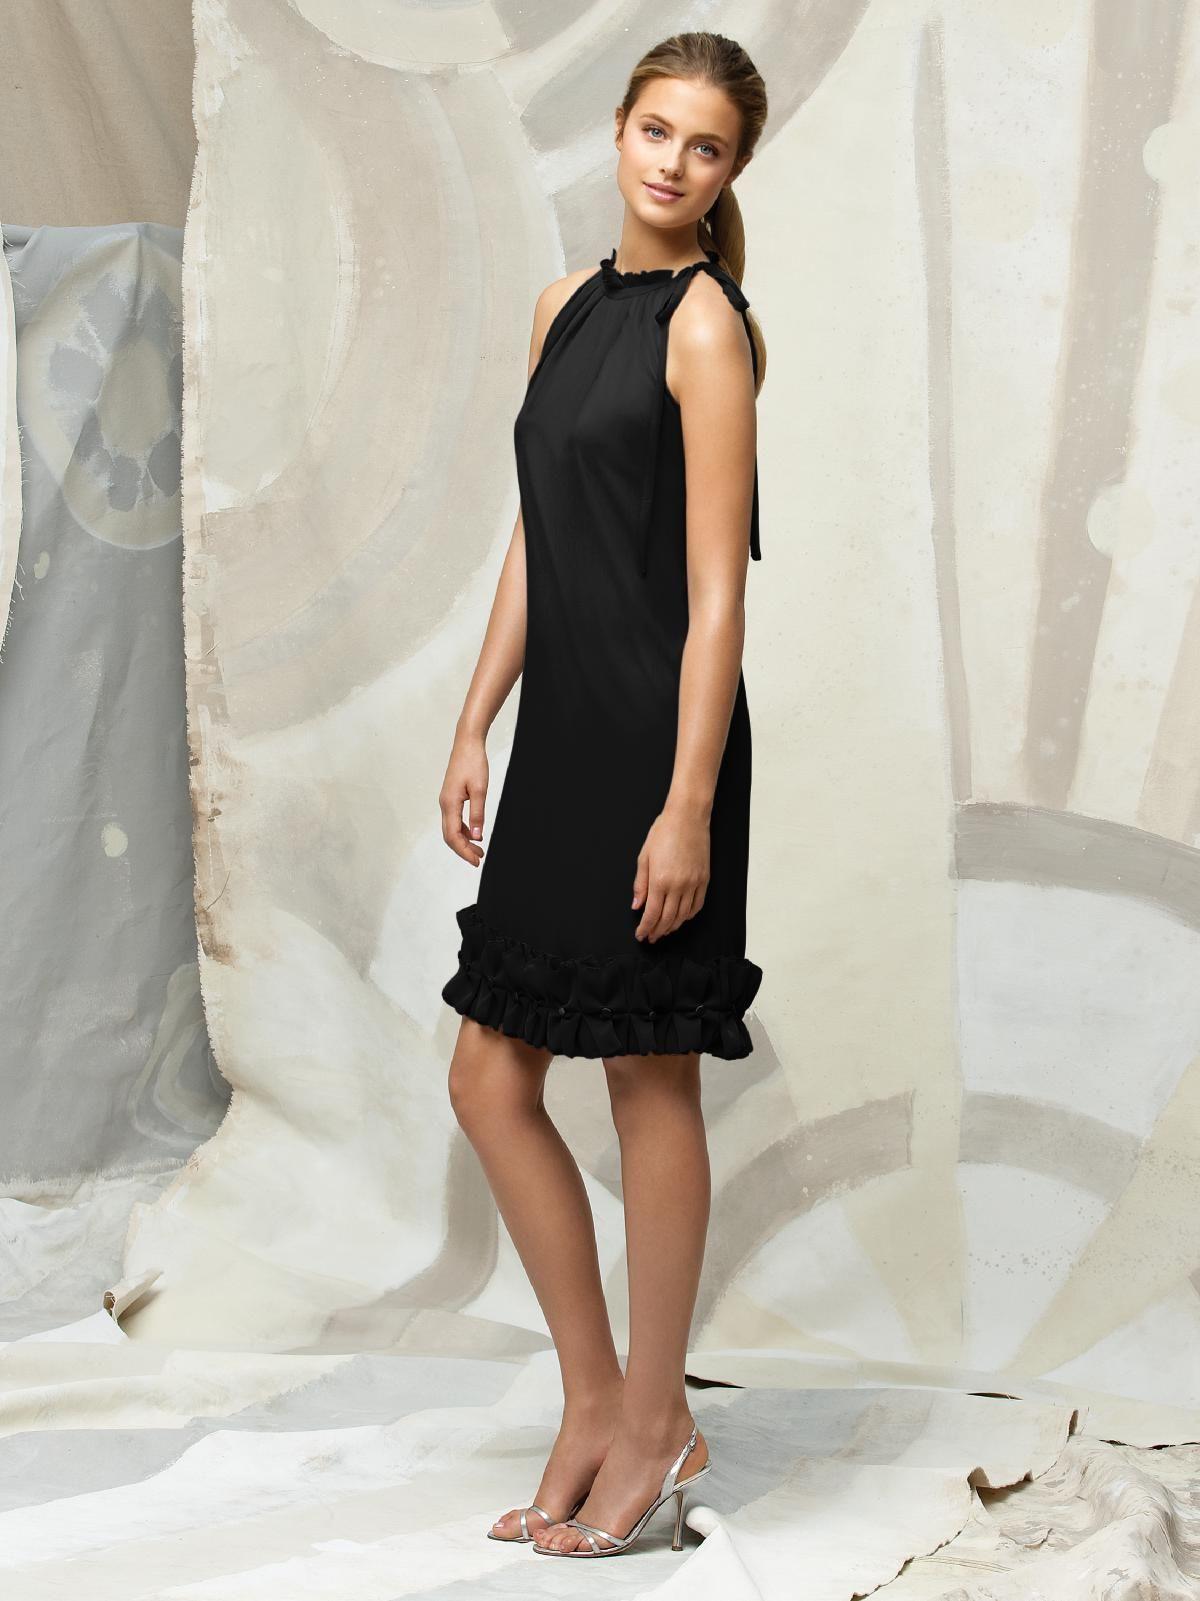 Lela rose black bridesmaid dress that black dress pinterest